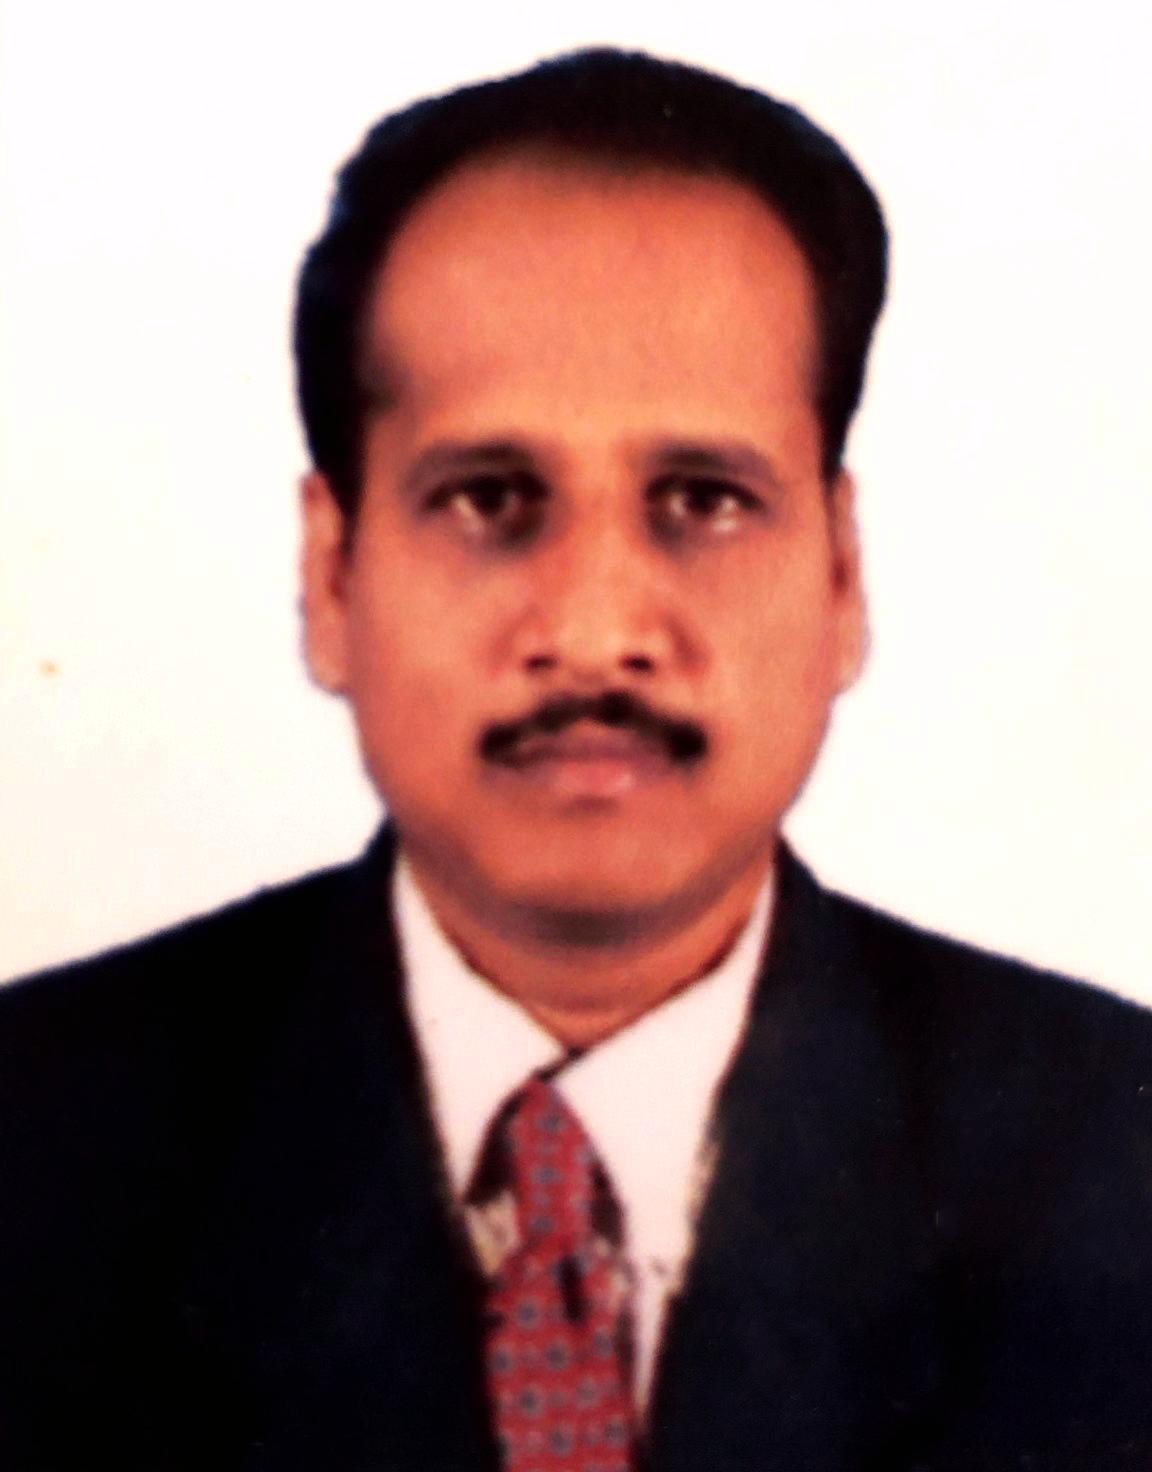 Seneerappa Narasimhulu Shrinivas Bojanampati